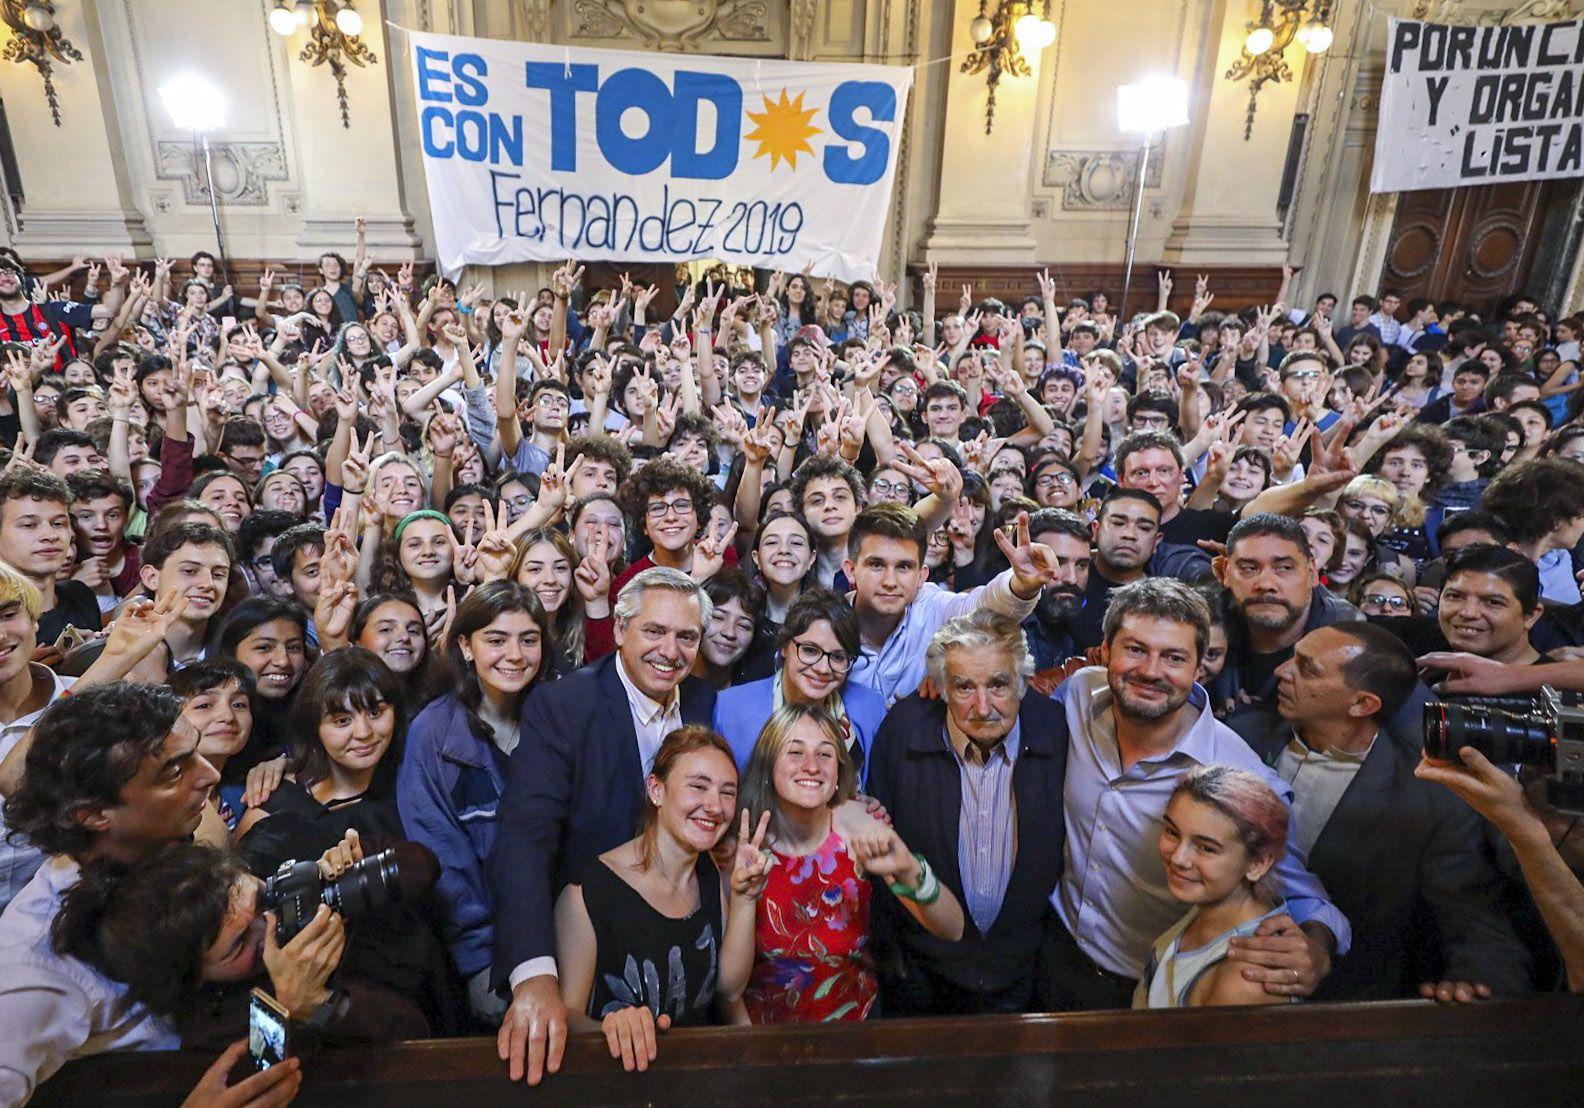 Mujica: Sé que Argentina va a salir de esta angustia, es un país riquísimo